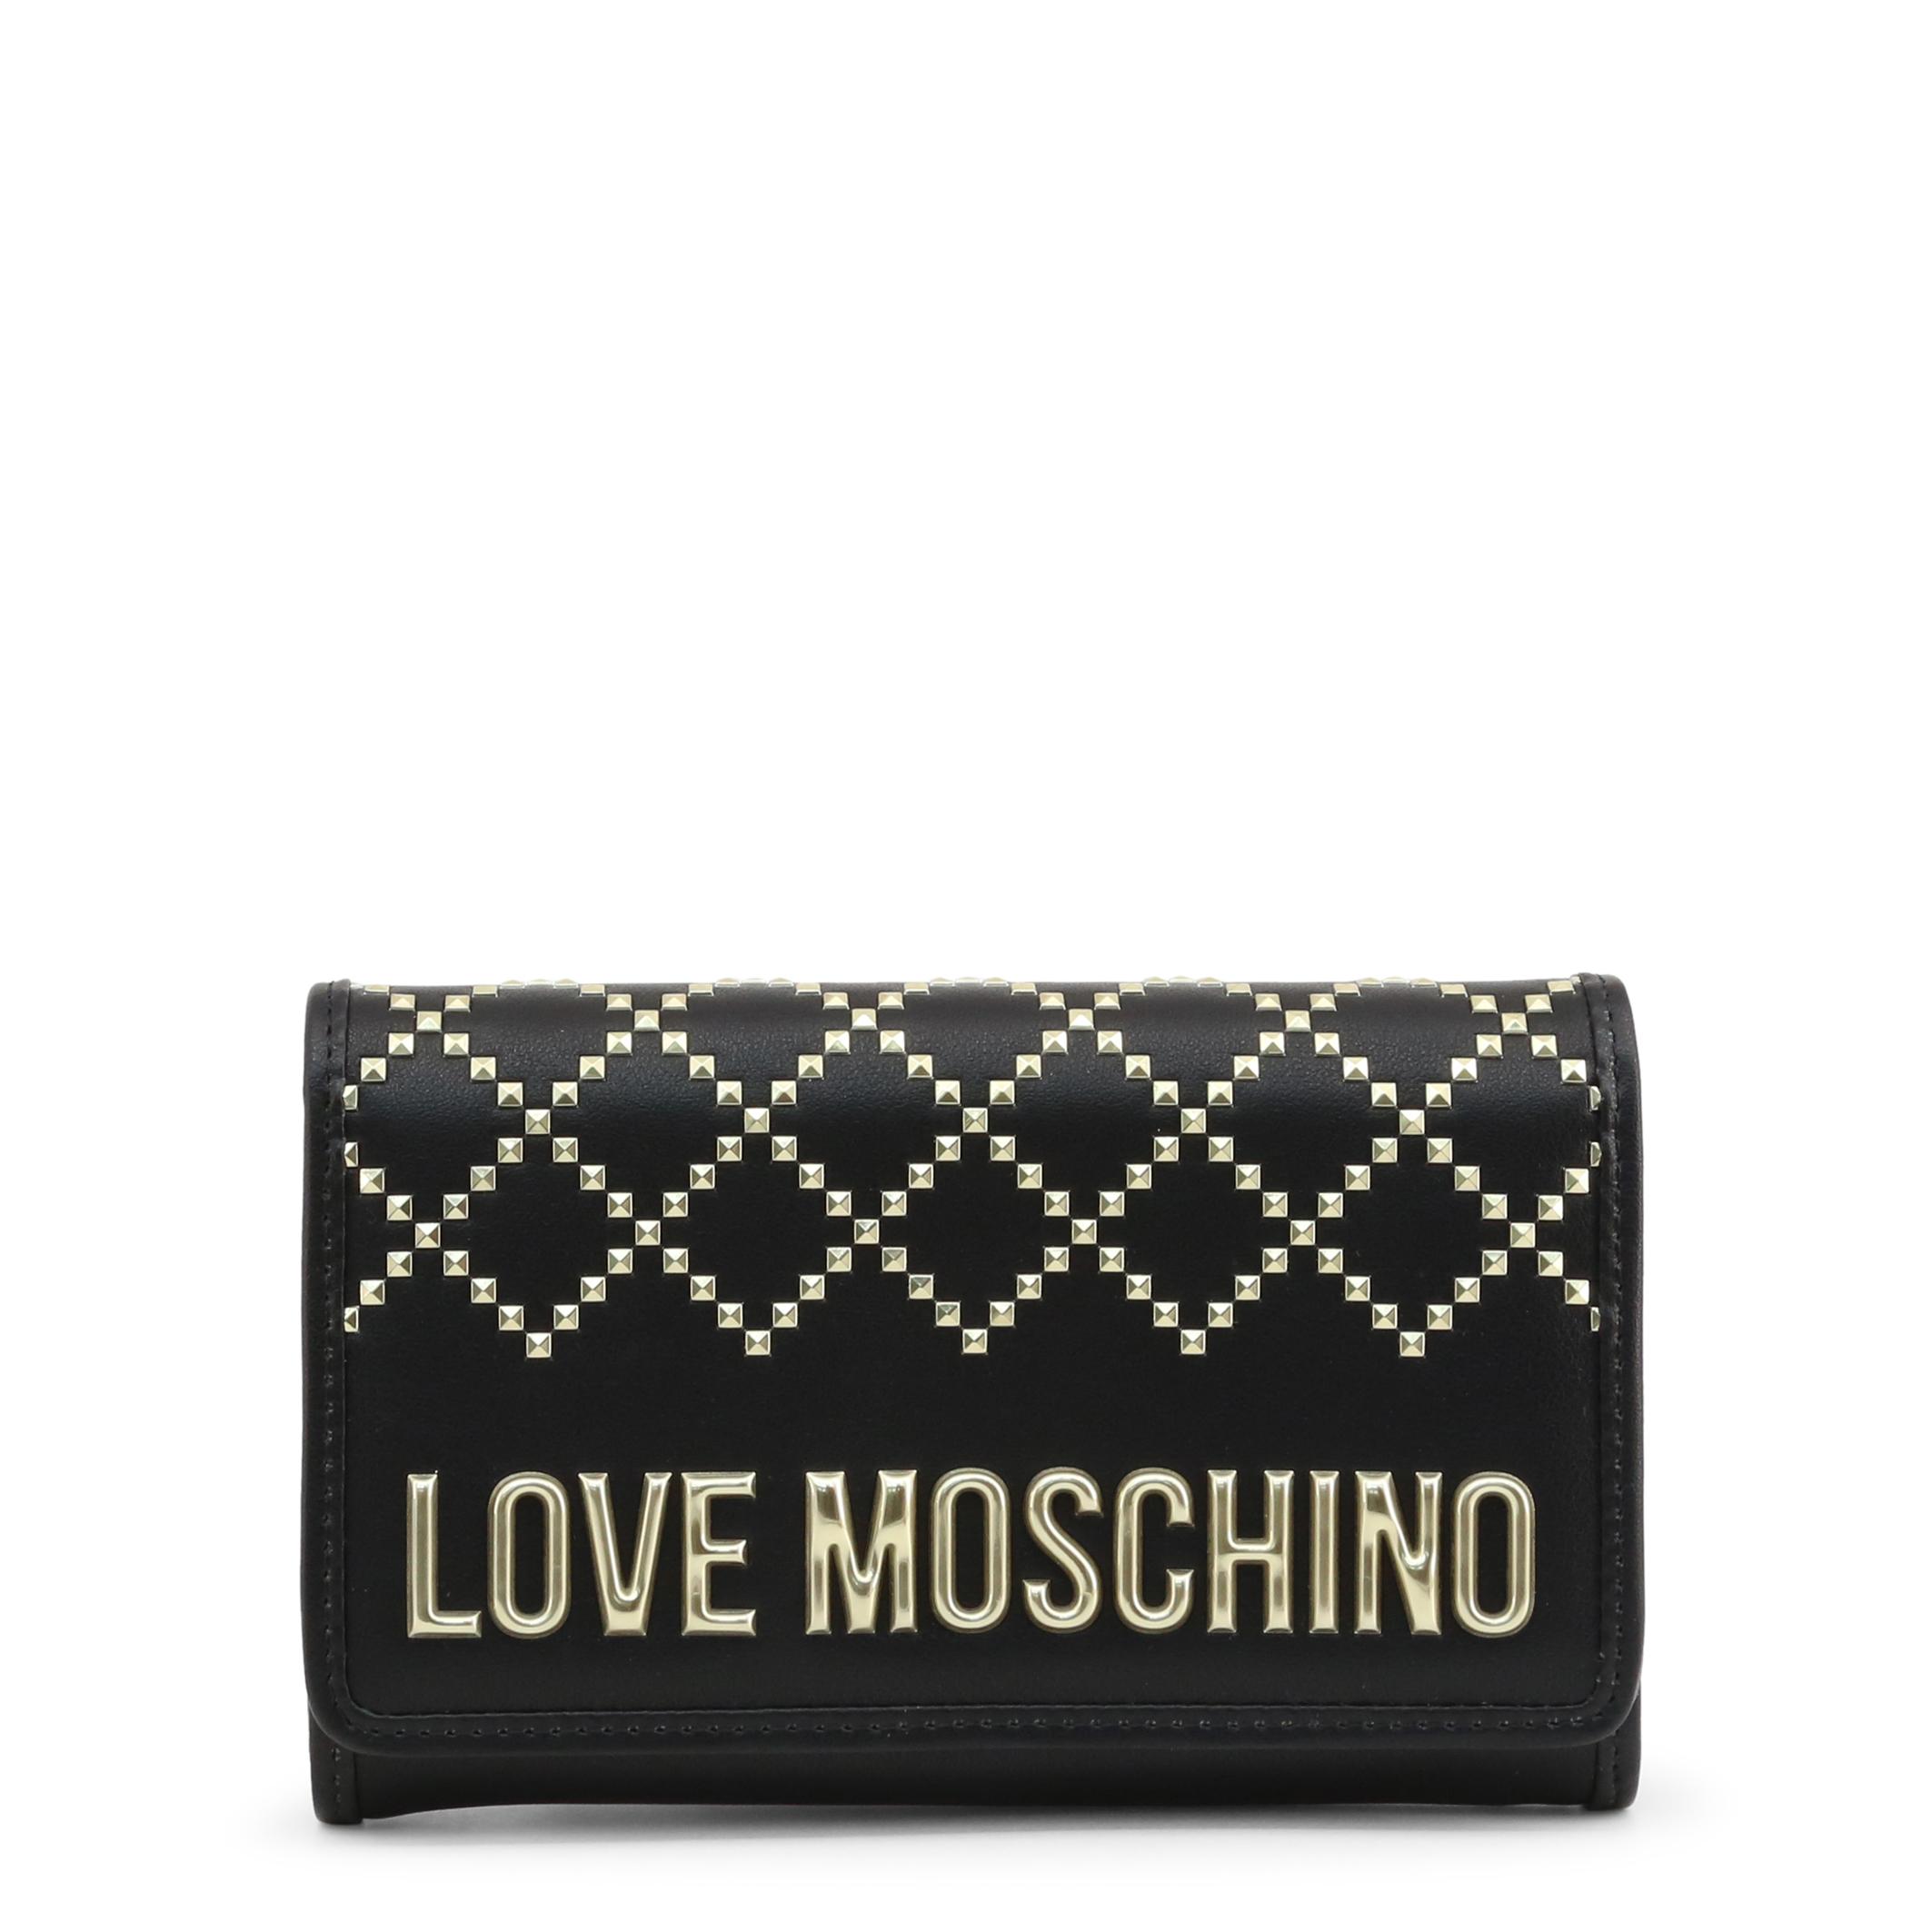 Portefeuilles / Porte-monnaie  Love moschino JC5621PP1BLG_0000 black